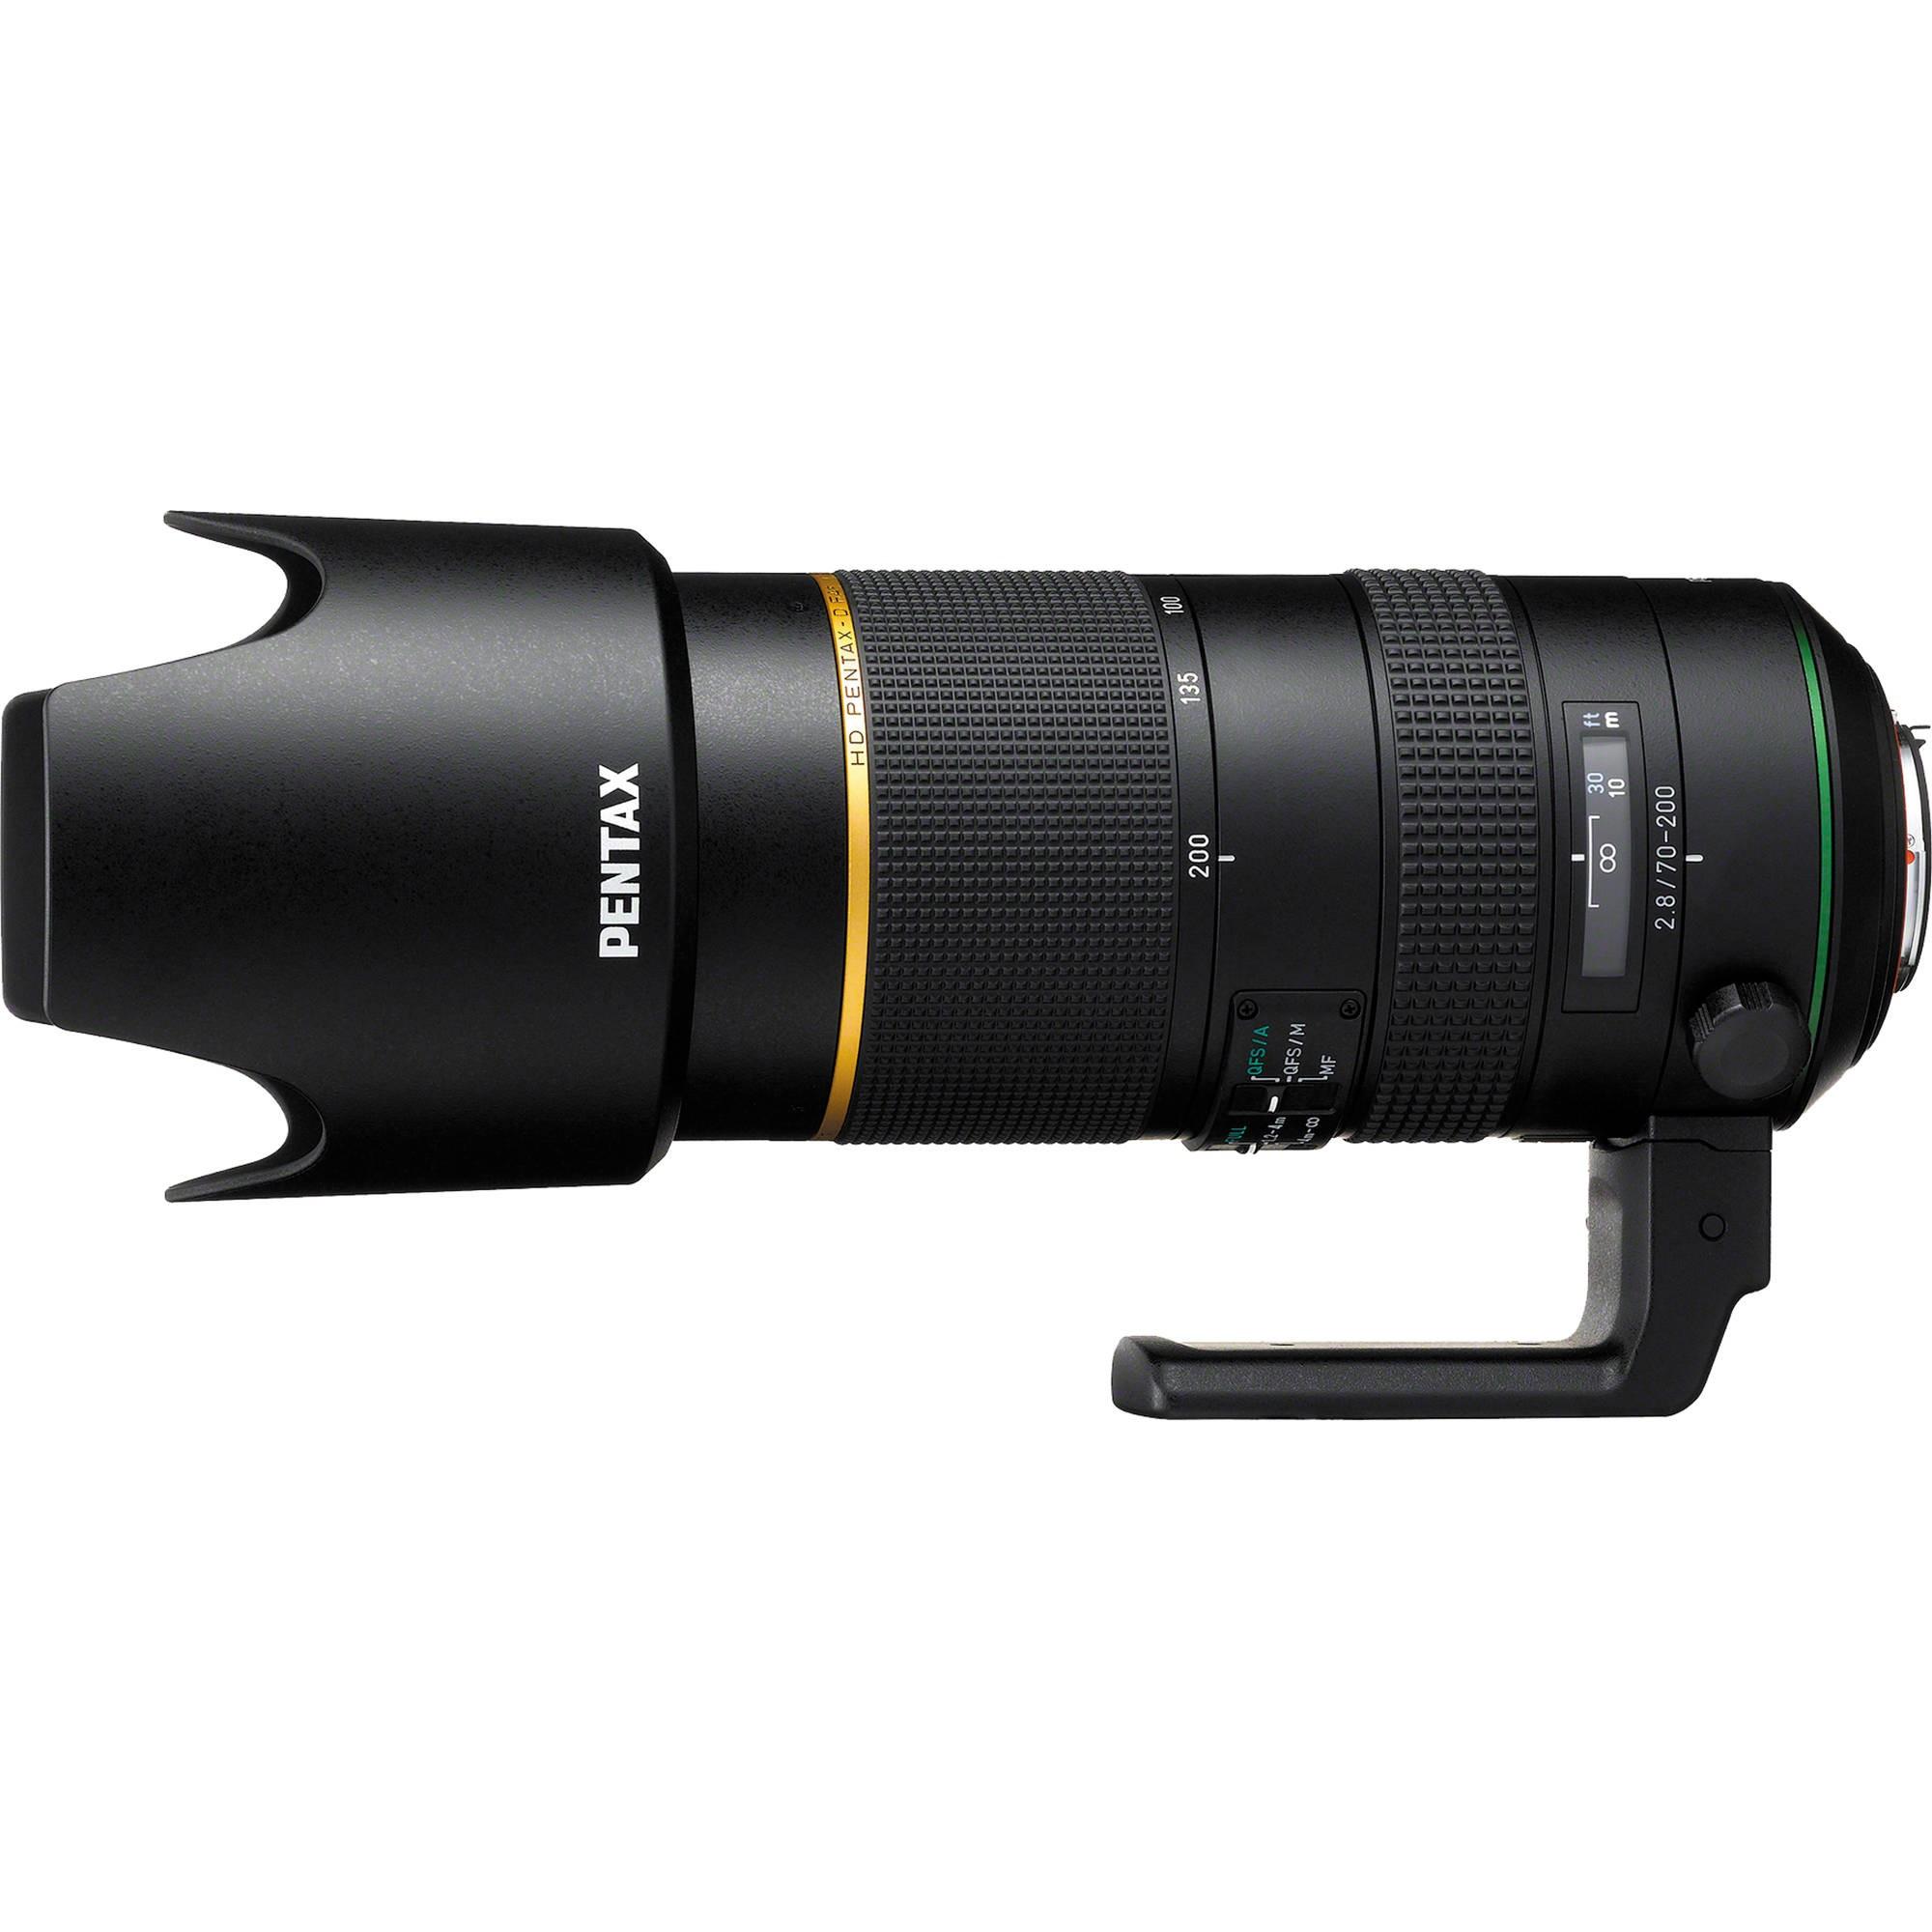 Pentax HD FA* 70-200mm f/2.8 ED DC AW